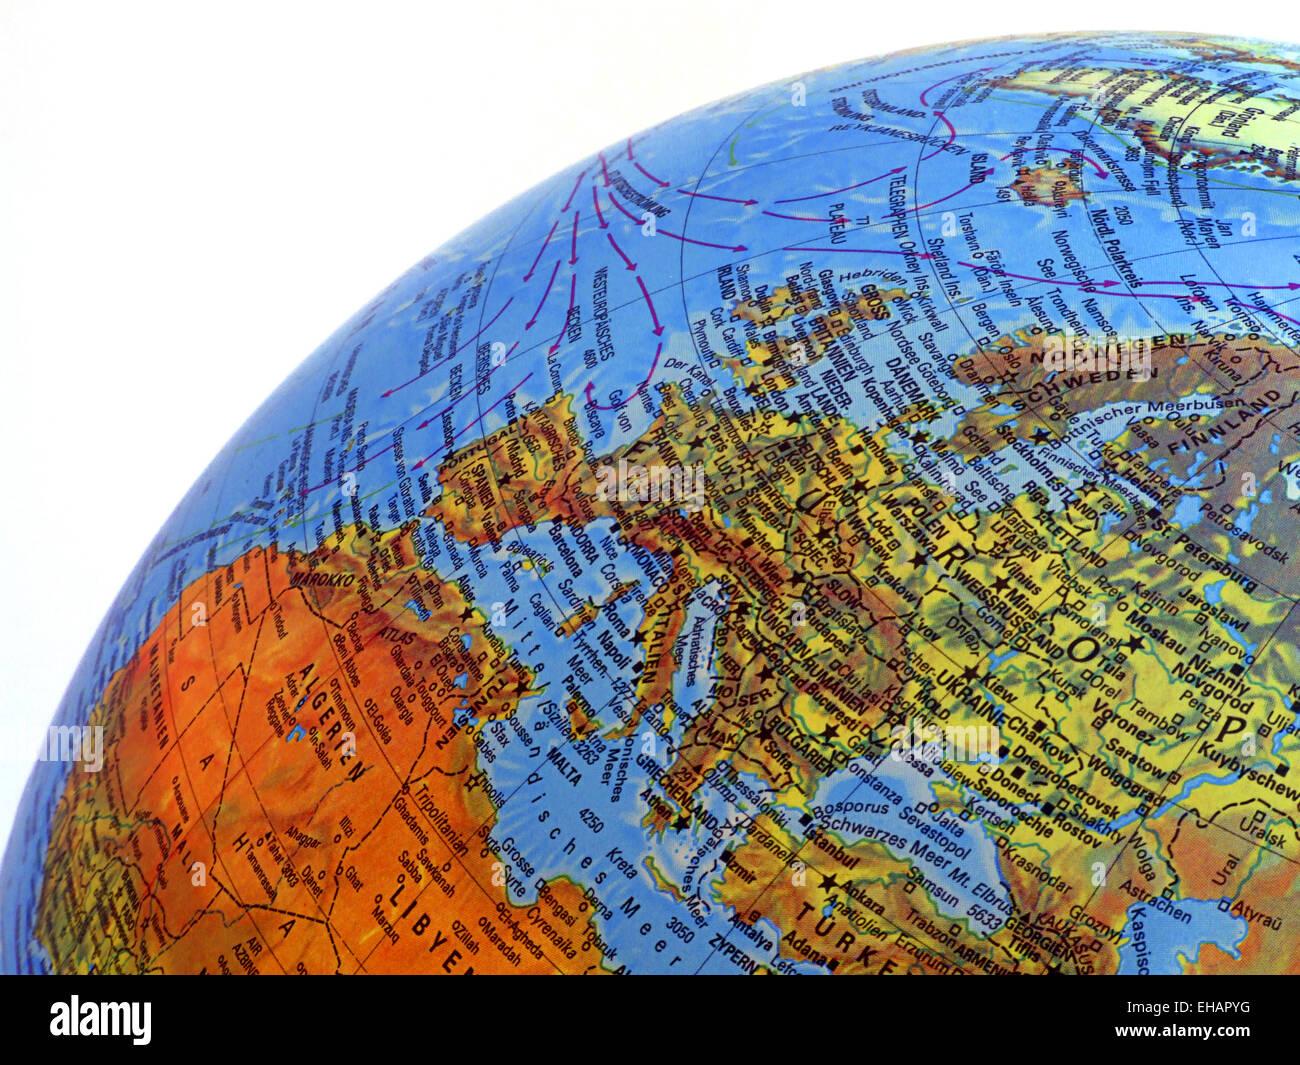 Globus Karte.Globus Karte Stock Photos Globus Karte Stock Images Alamy